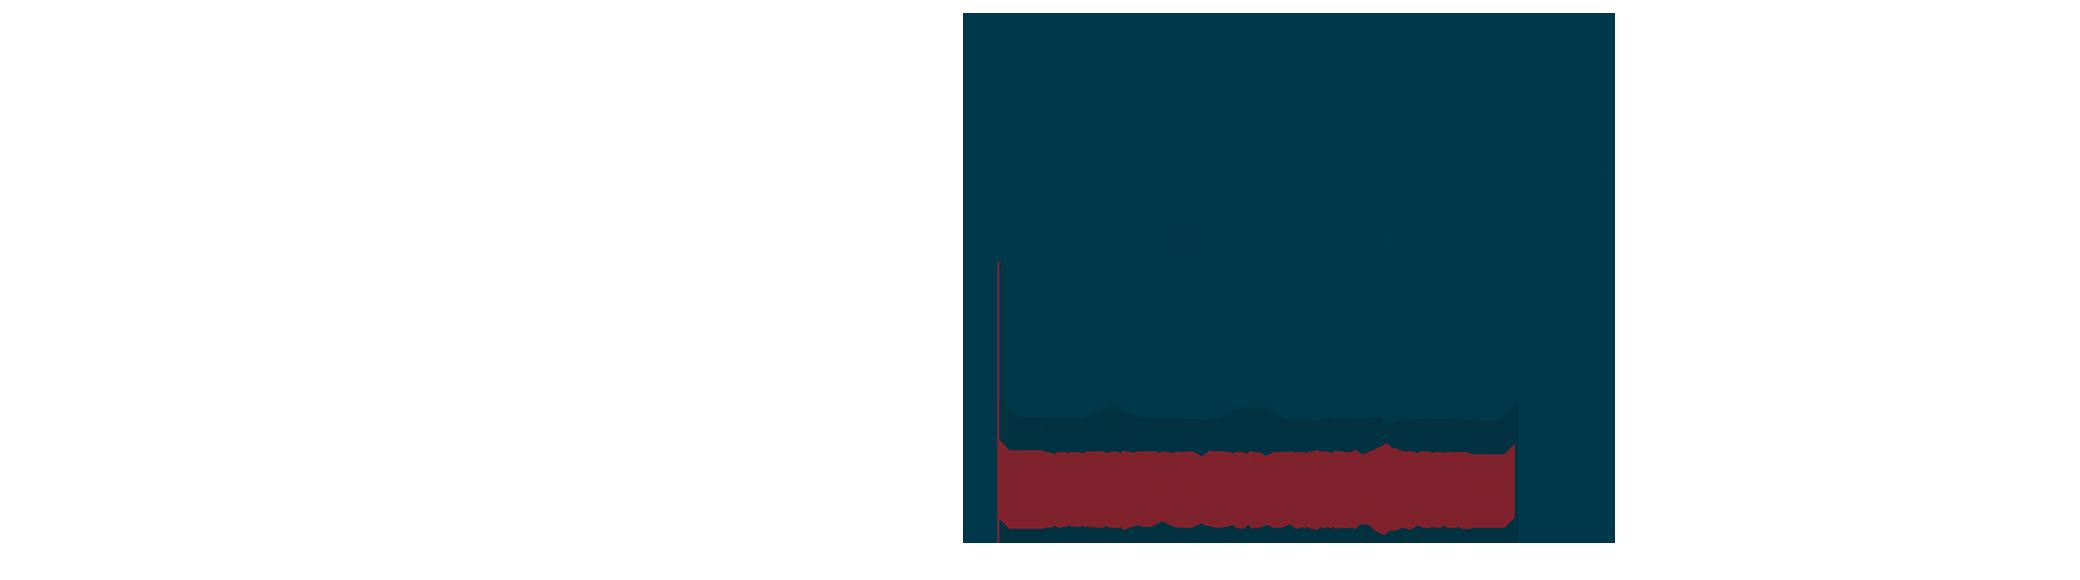 David Nail Night\'s On Fire Tour 2016 - CID Entertainment